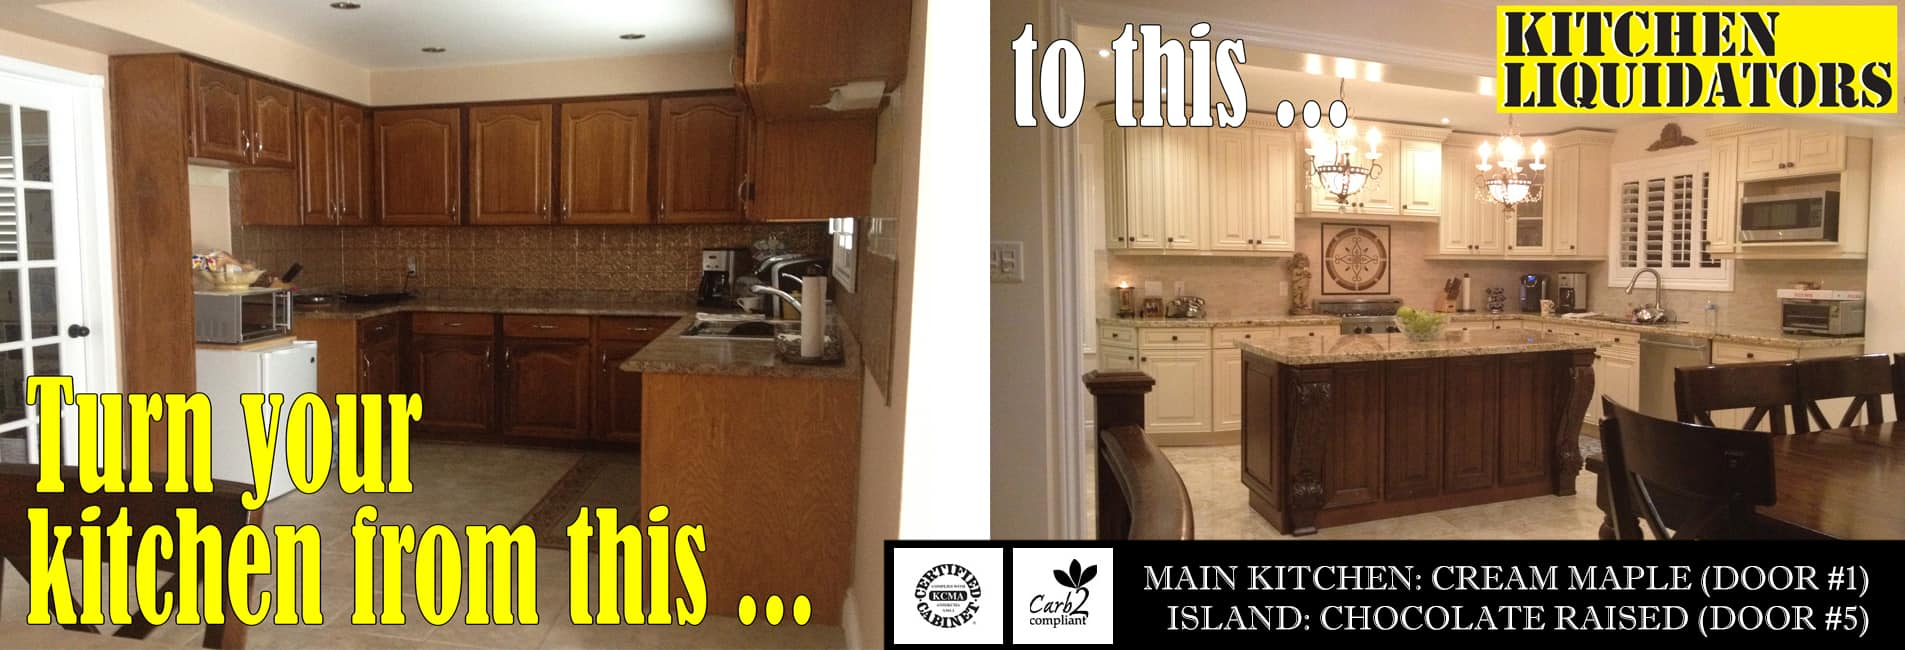 Canada Kitchen Liquidators Kitchen Cabinets Sinks